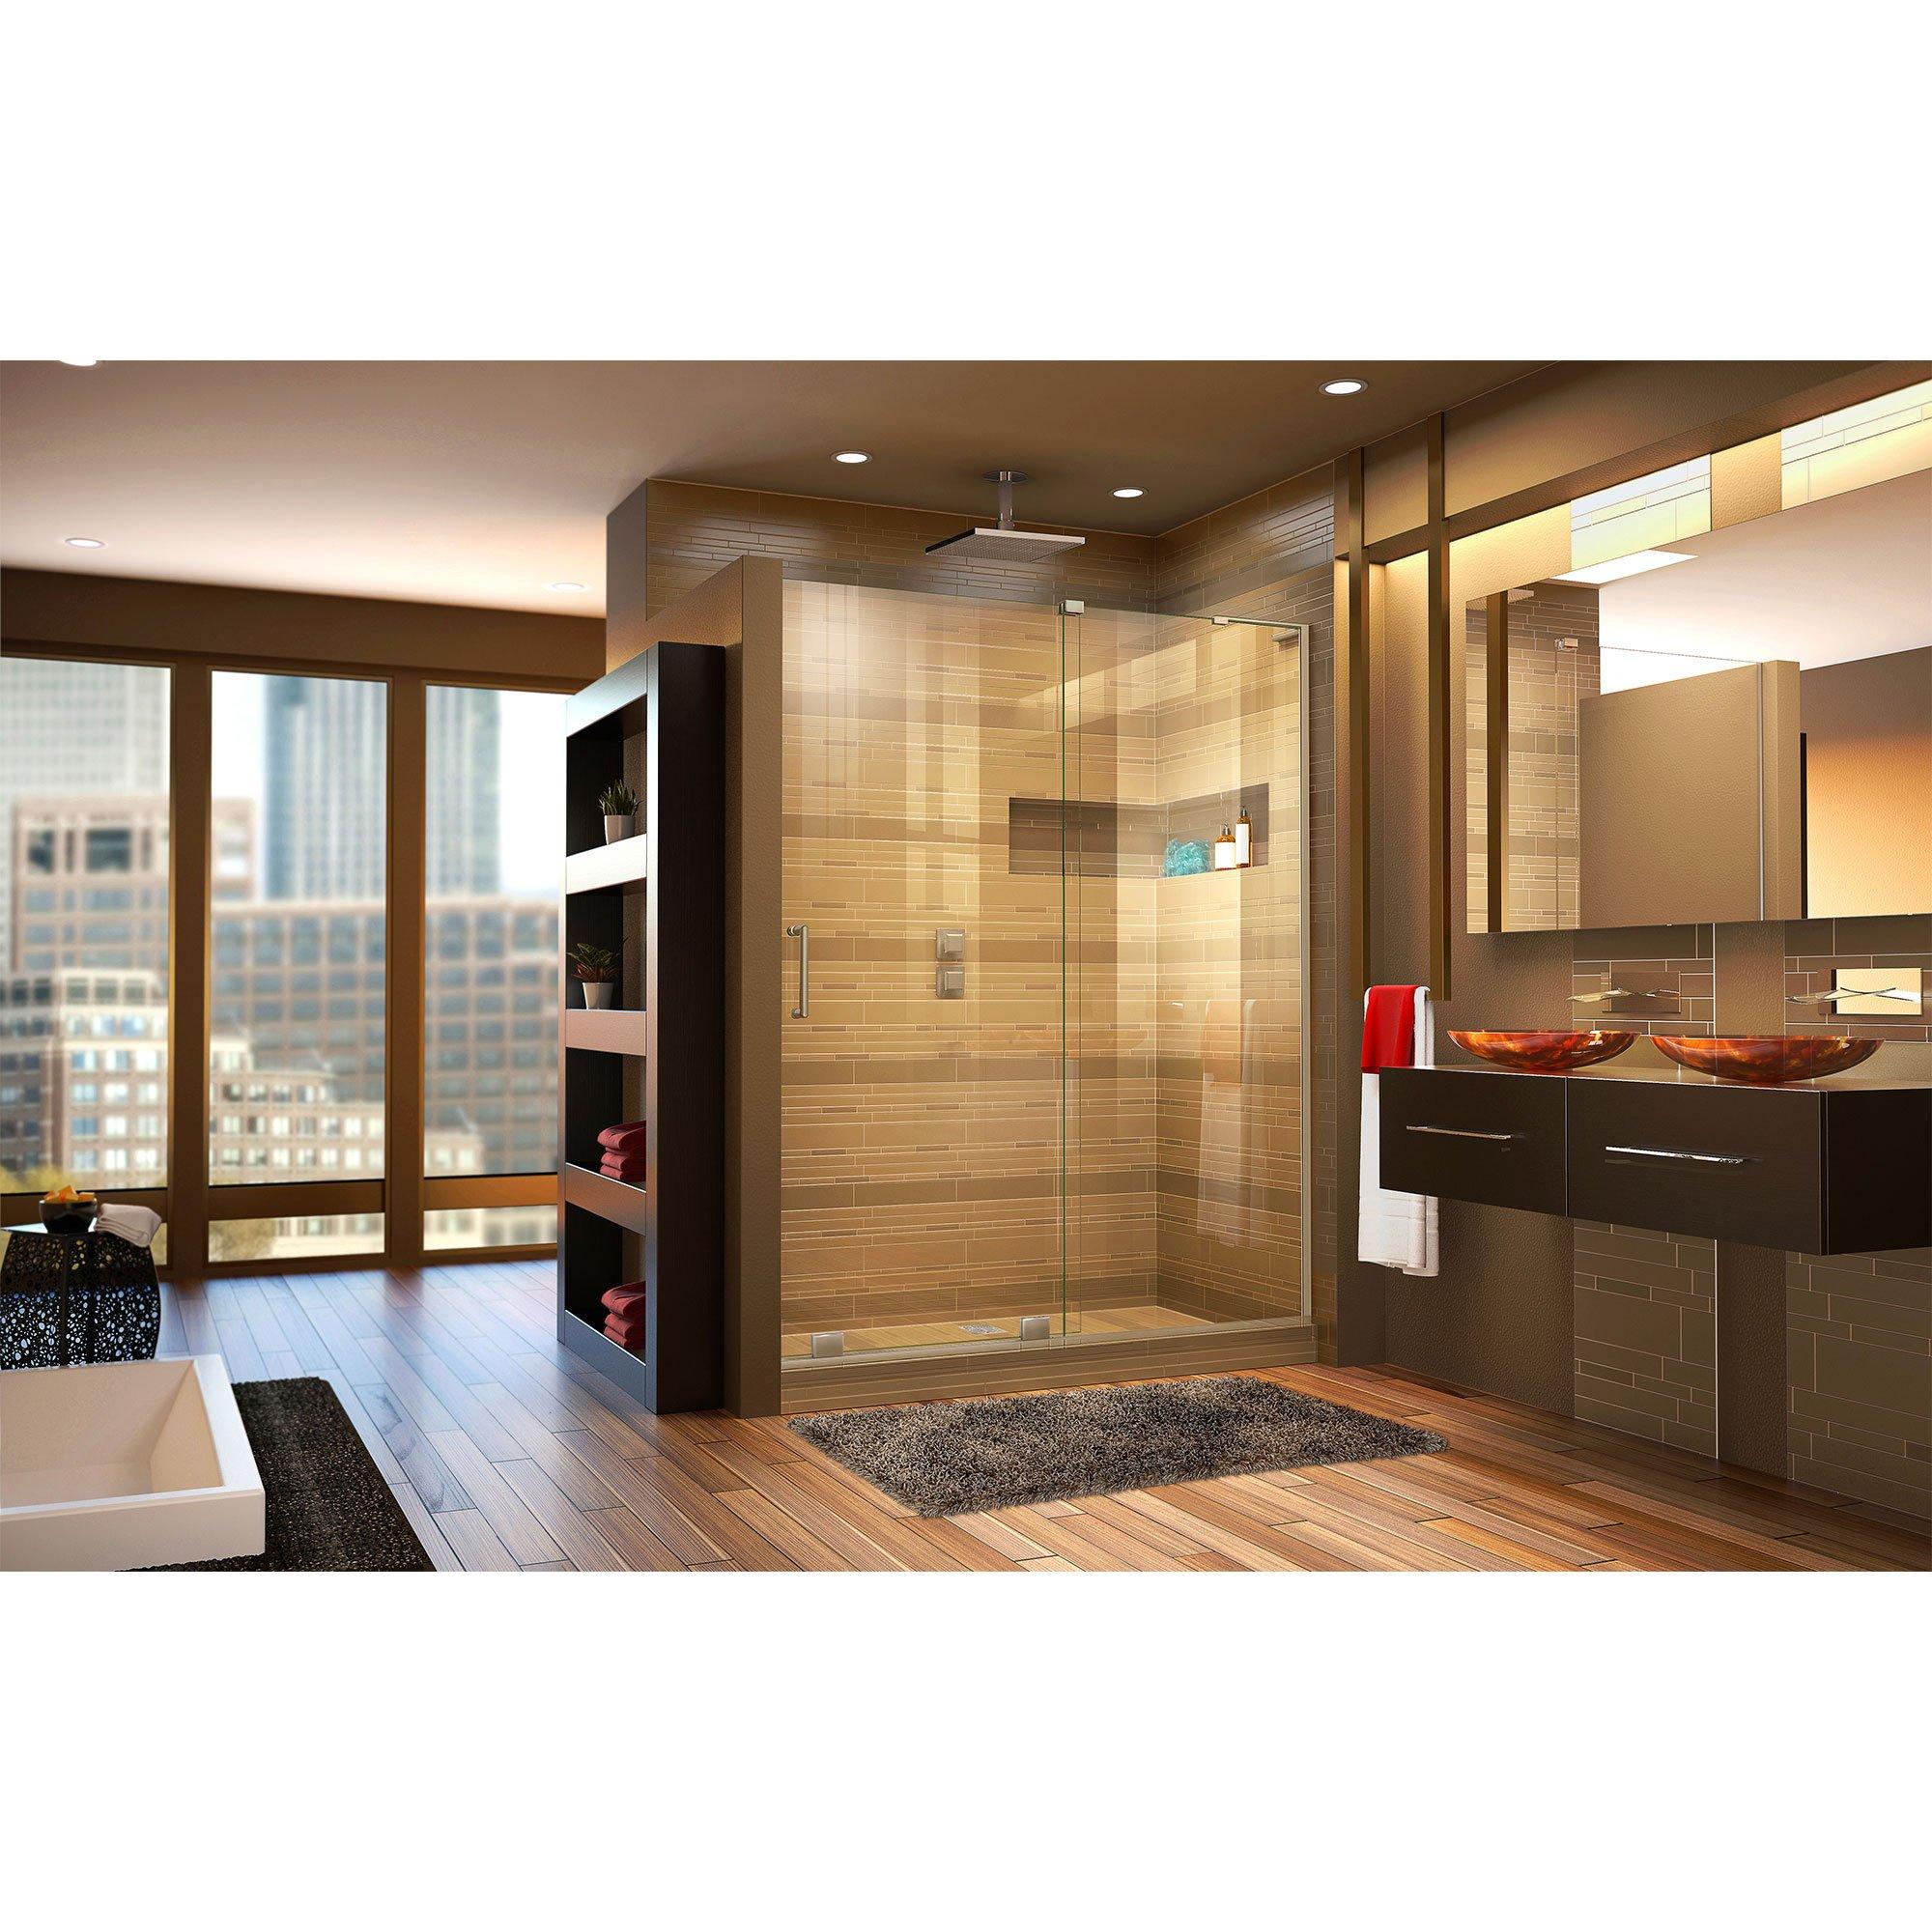 DreamLine Mirage-X 56-60 in. Width, Frameless Sliding Shower Door, 3/8'' Glass, Brushed Nickel Finish by DreamLine (Image #3)